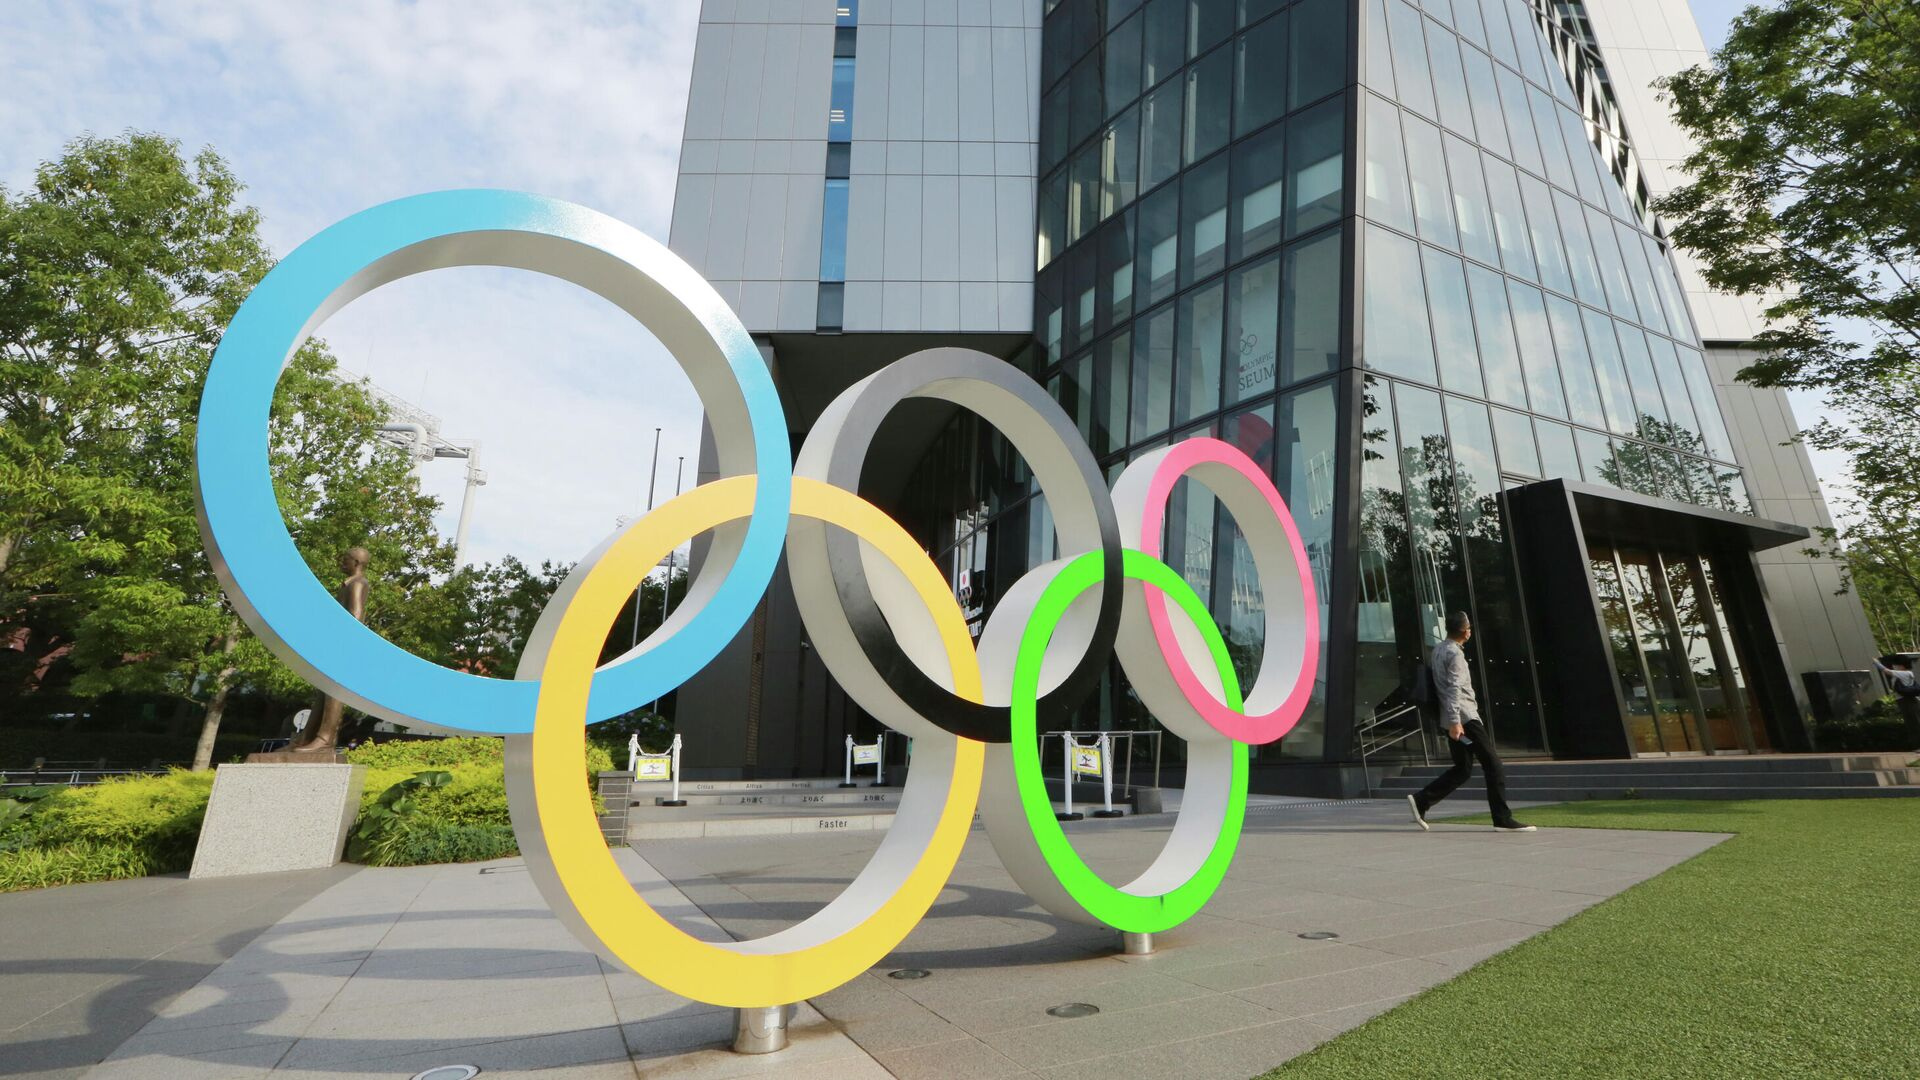 Олимпийские кольца в Токио - РИА Новости, 1920, 20.07.2021